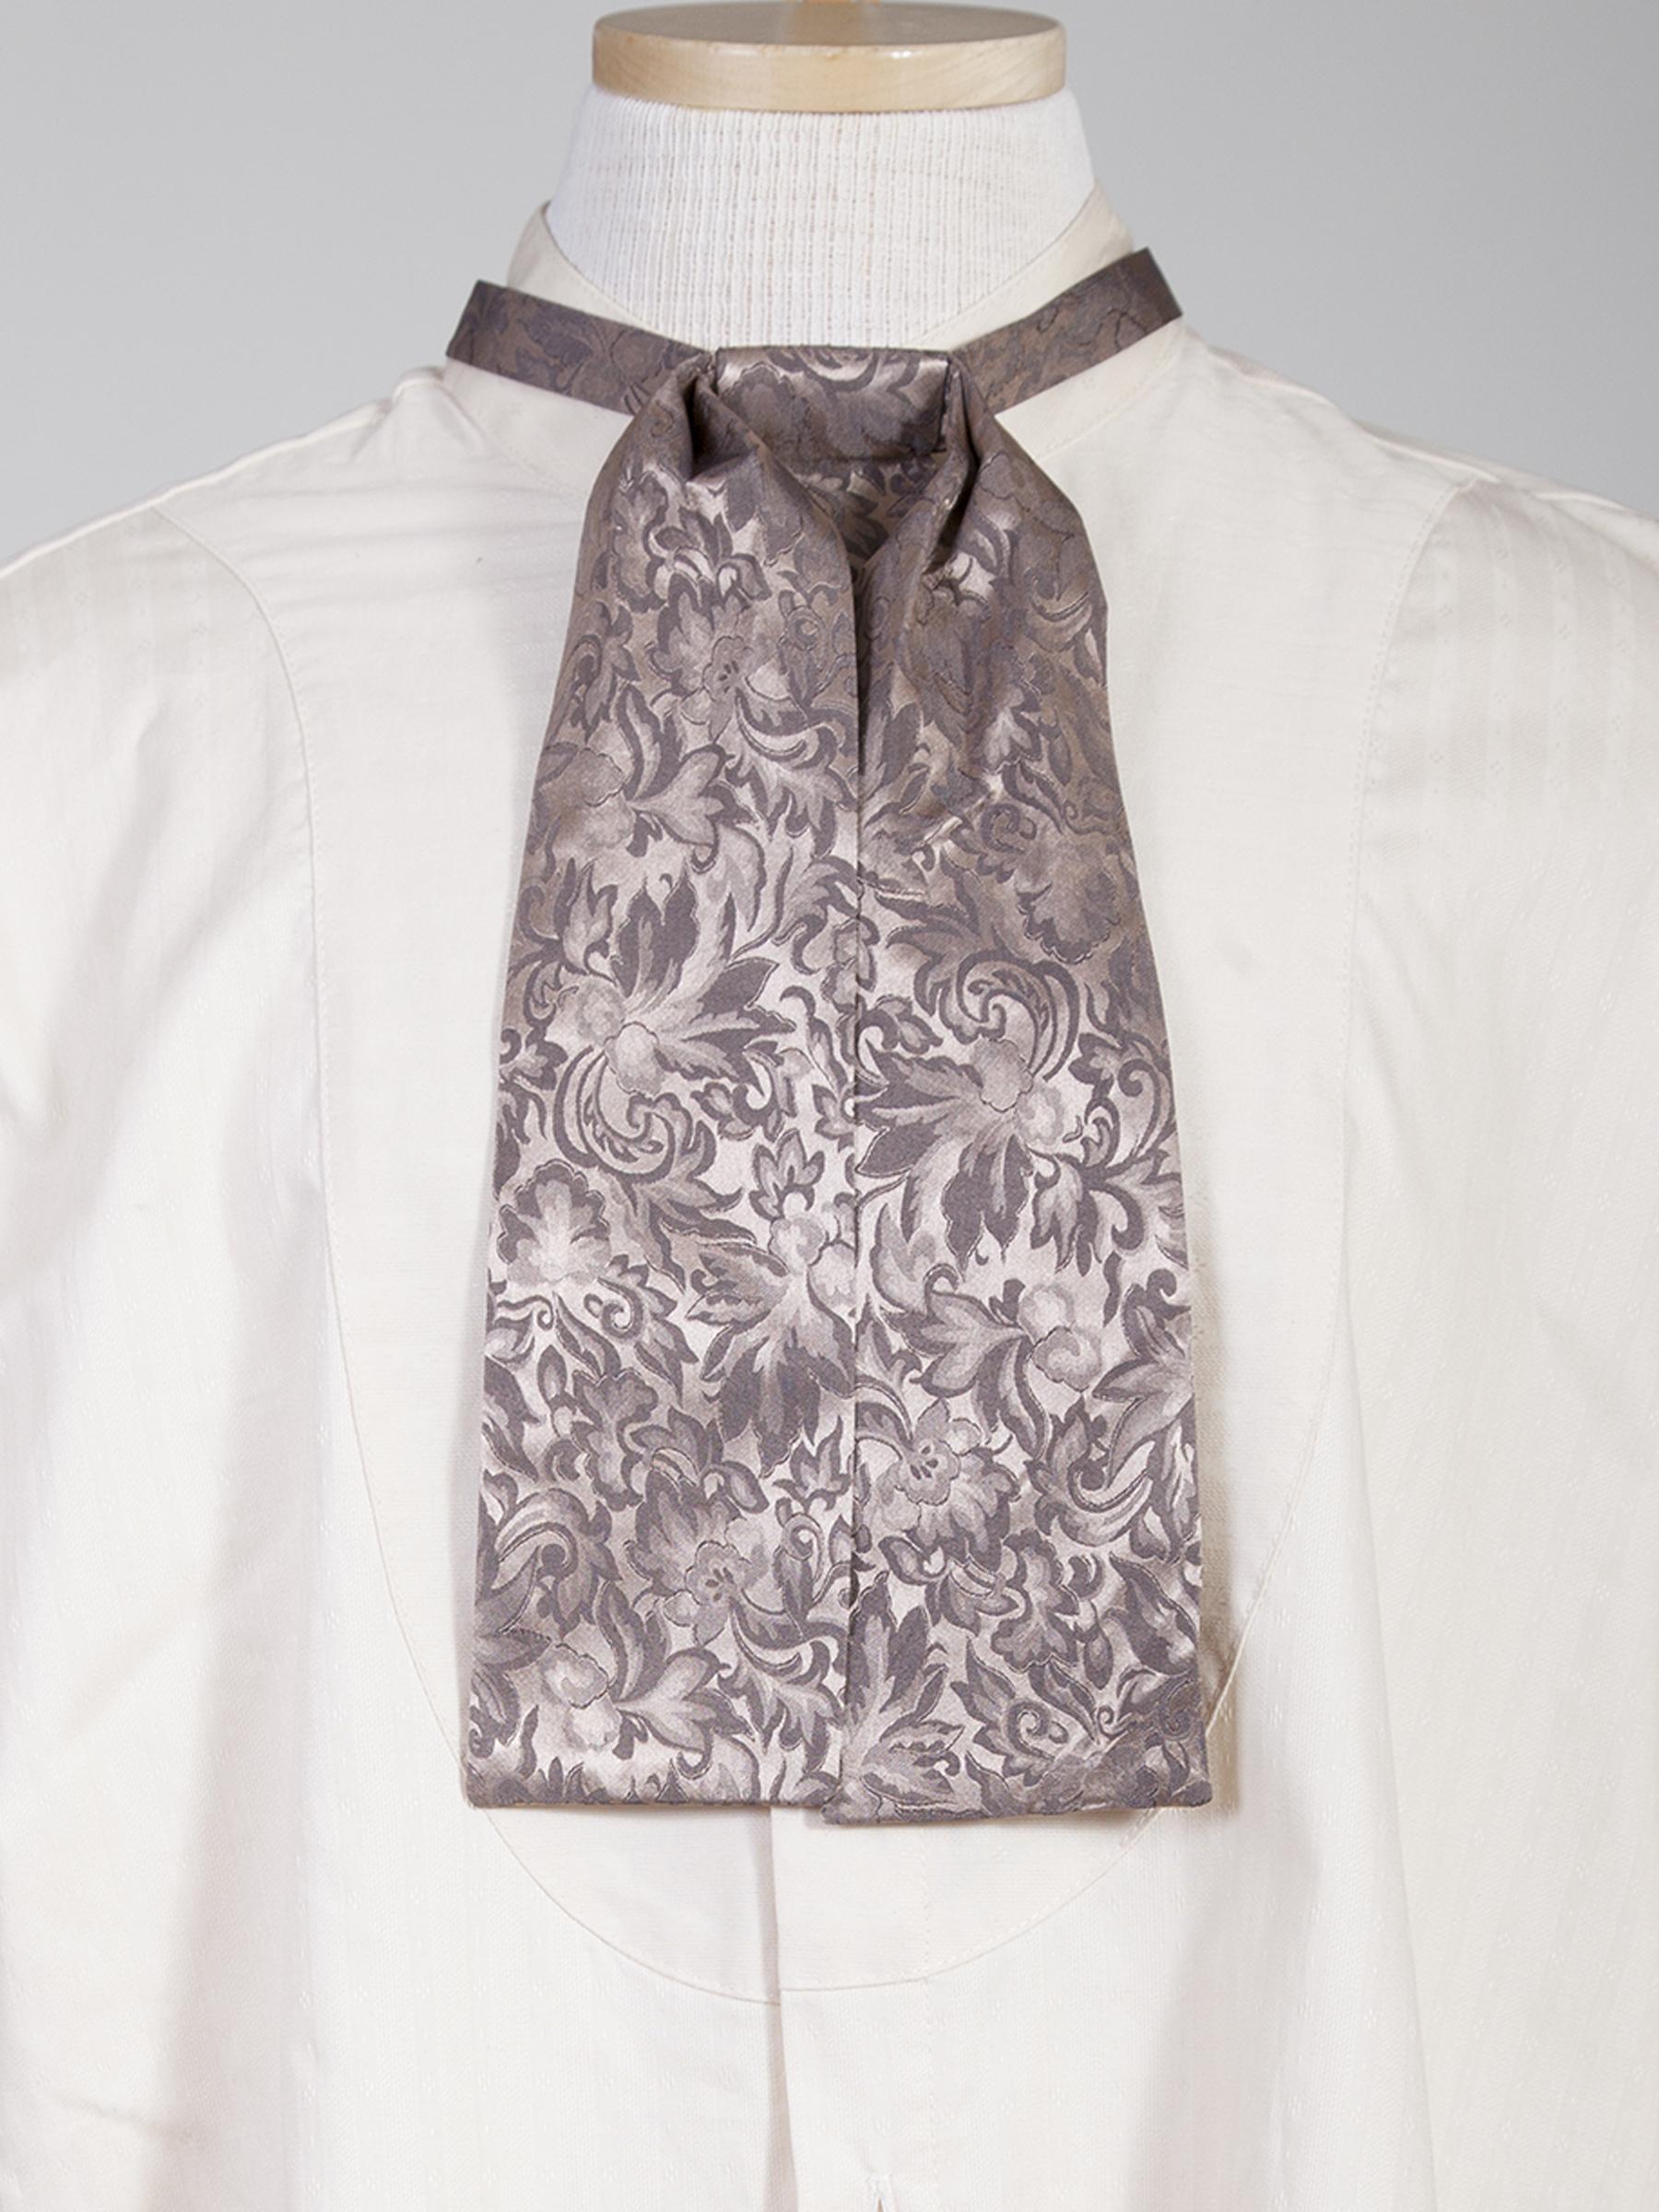 Beautiful silk jacquard and an adjustable neck band